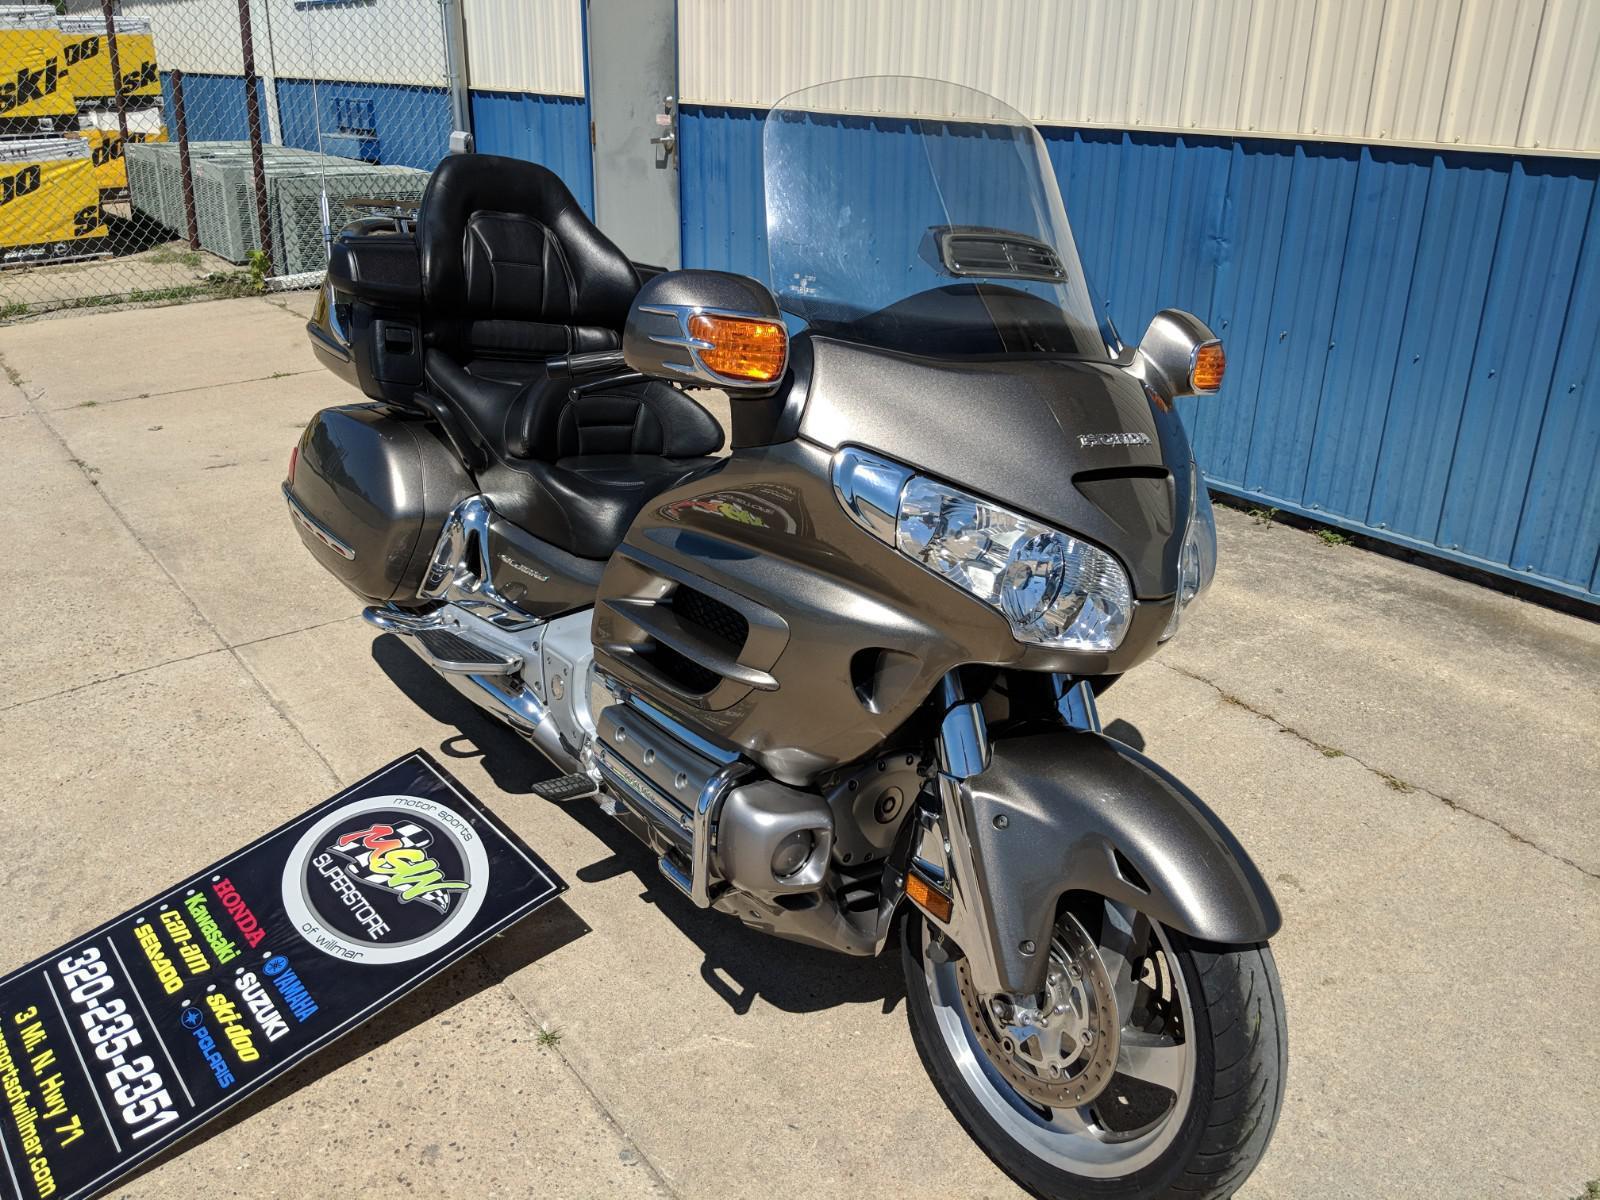 2006 Honda GL1800 for sale in Willmar, MN. Motor Sports of ...